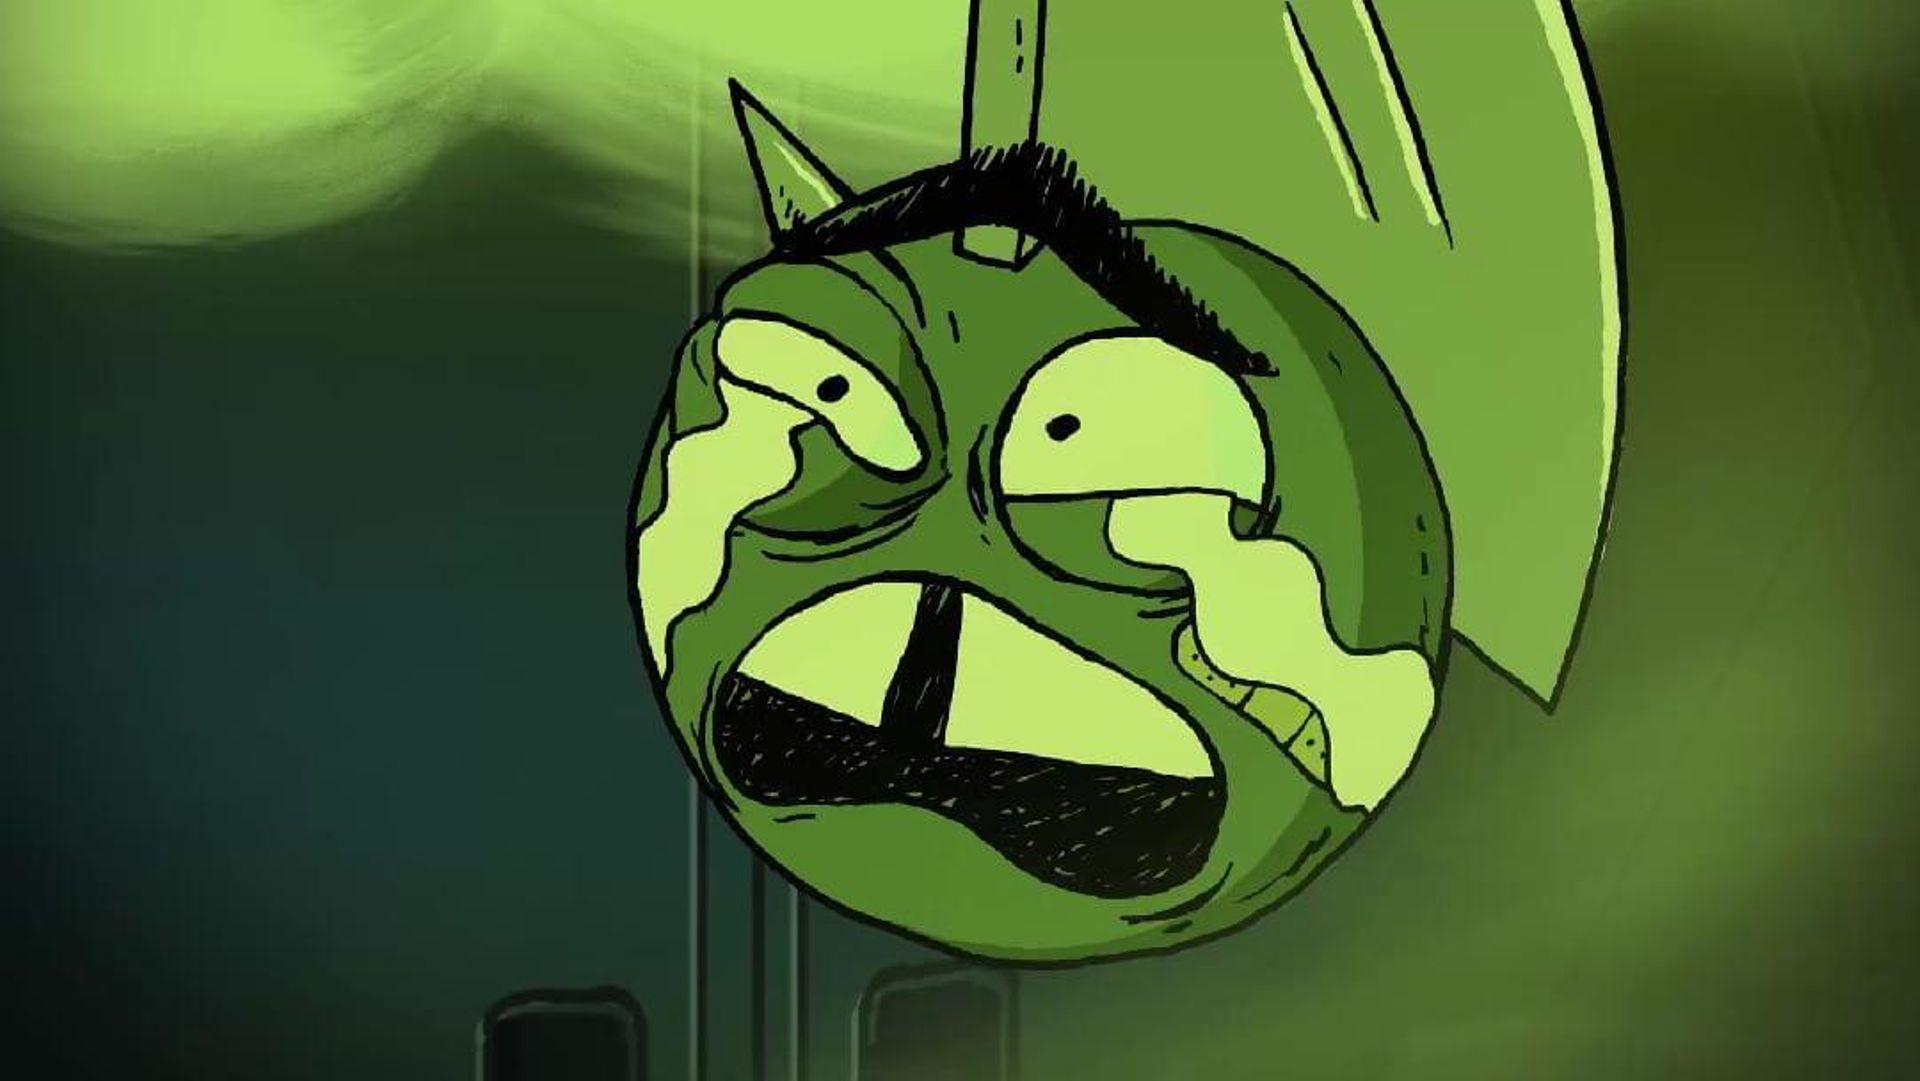 Ballmastrz: 9009 - Stink Bomb